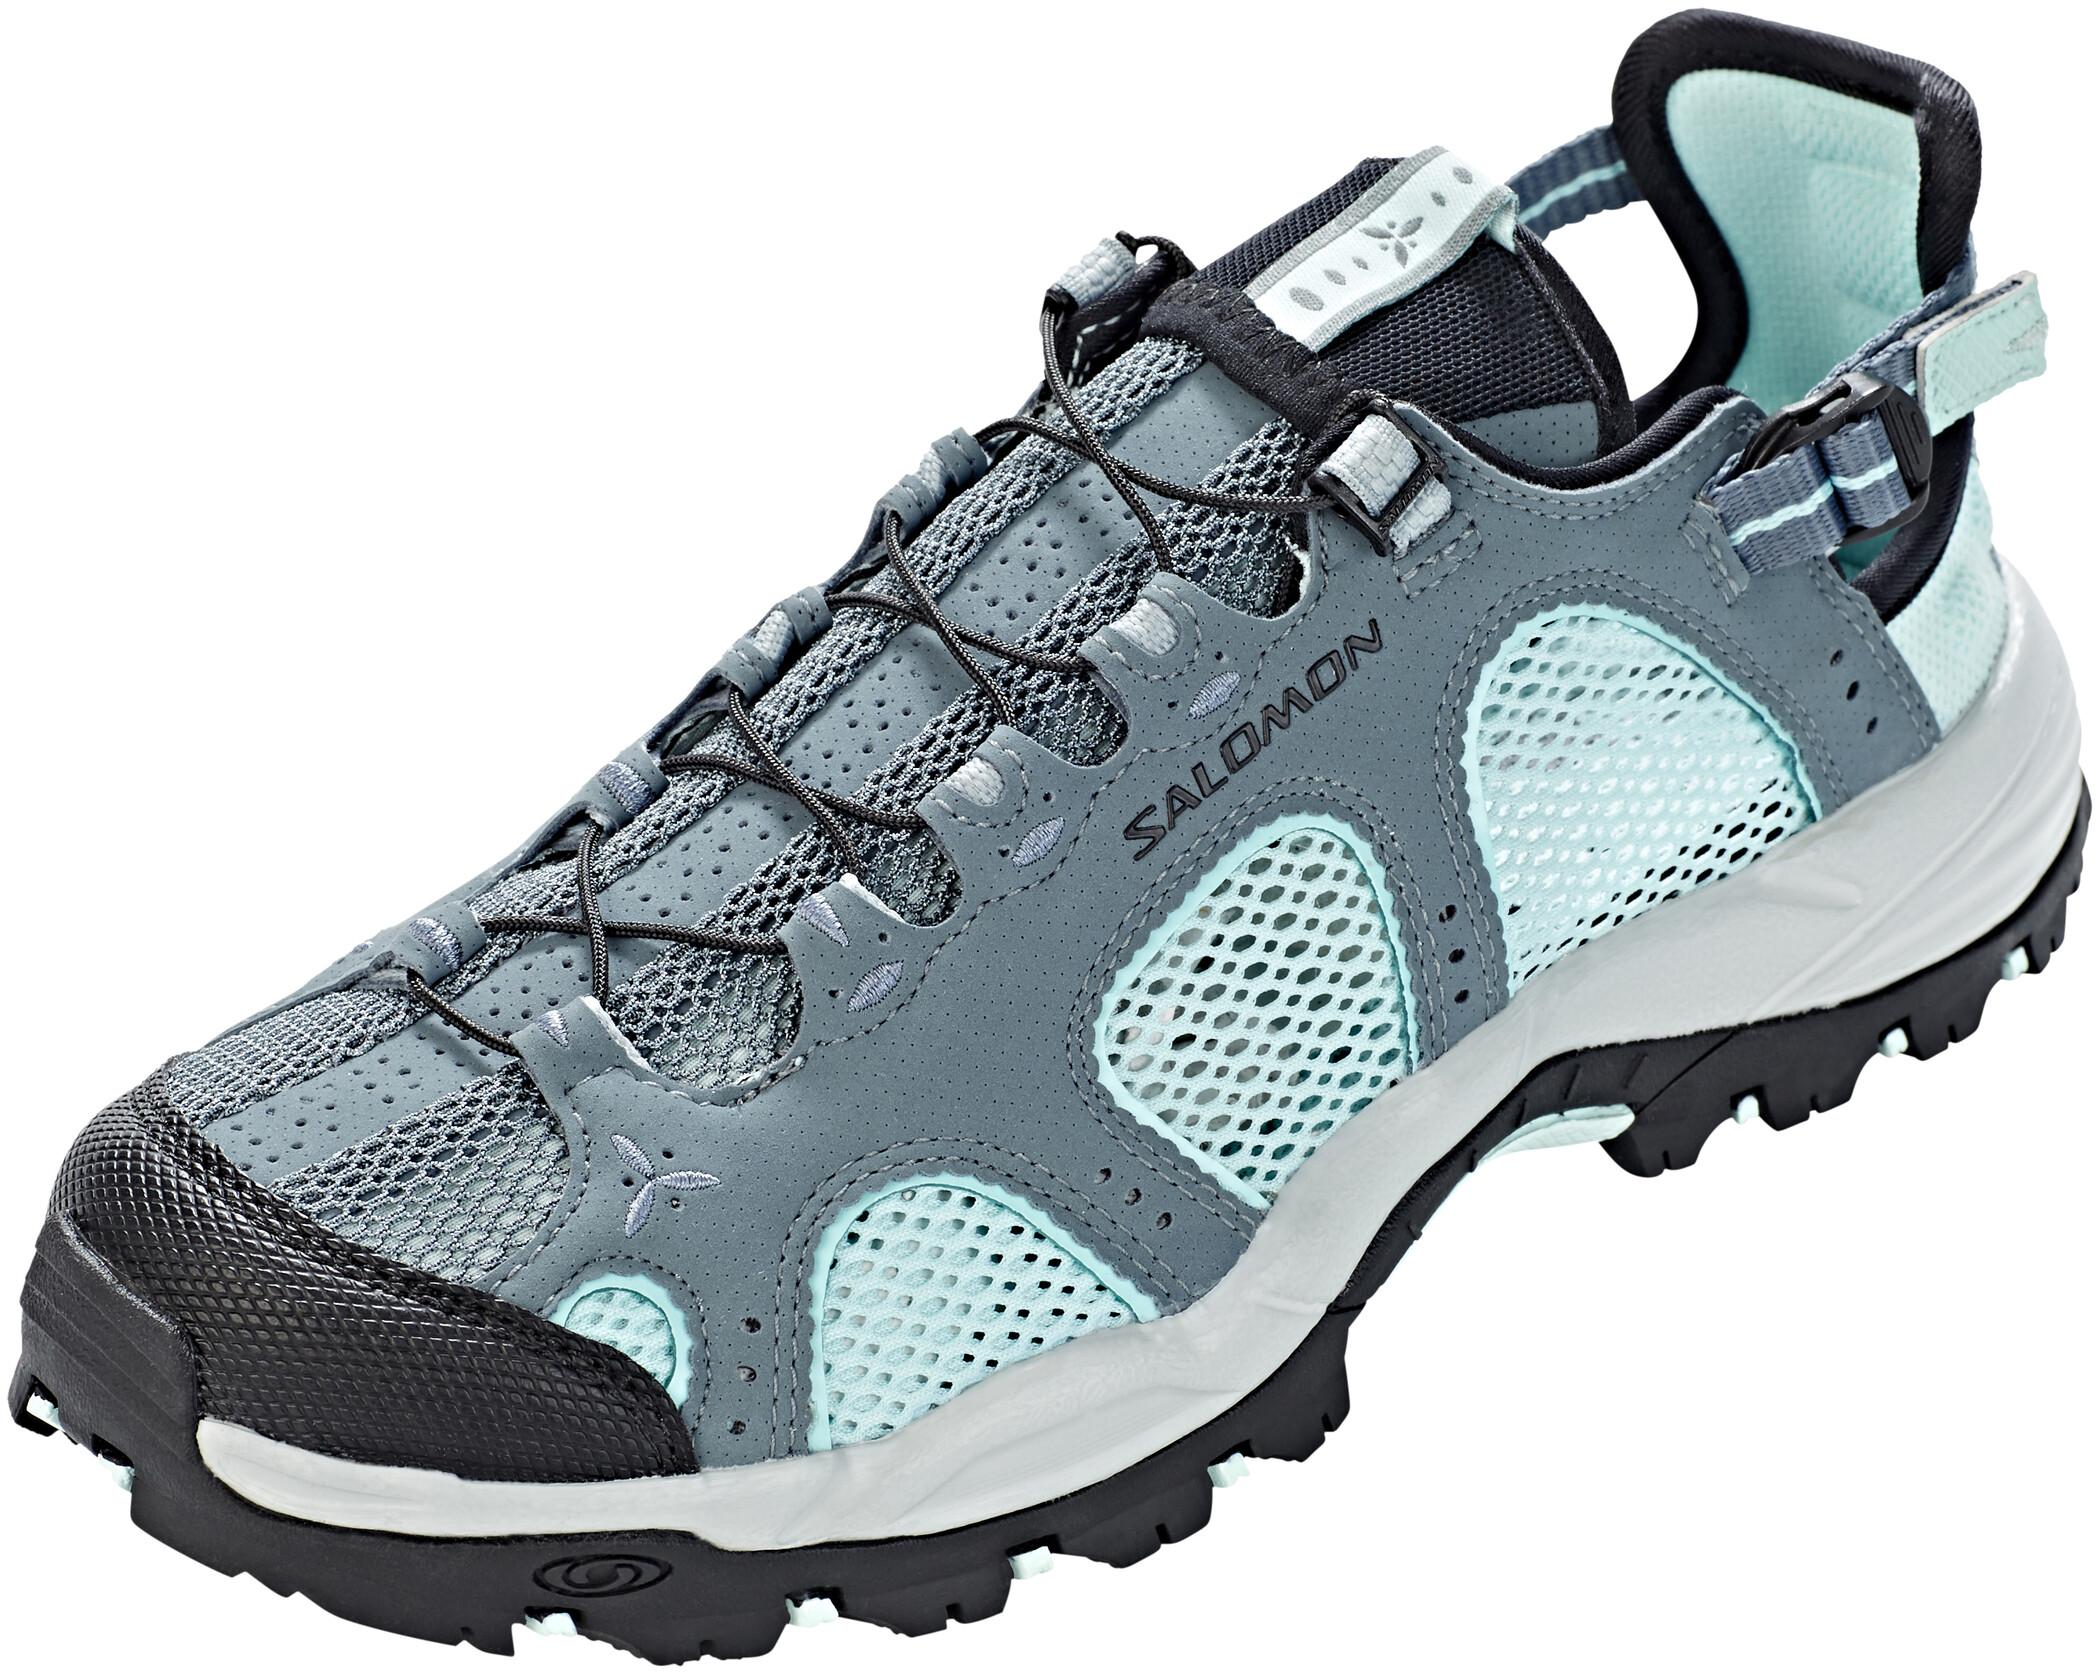 2d1202470c Salomon Techamphibian 3 Shoes Women Stormy Weather Eggshell Blue Black.jpg